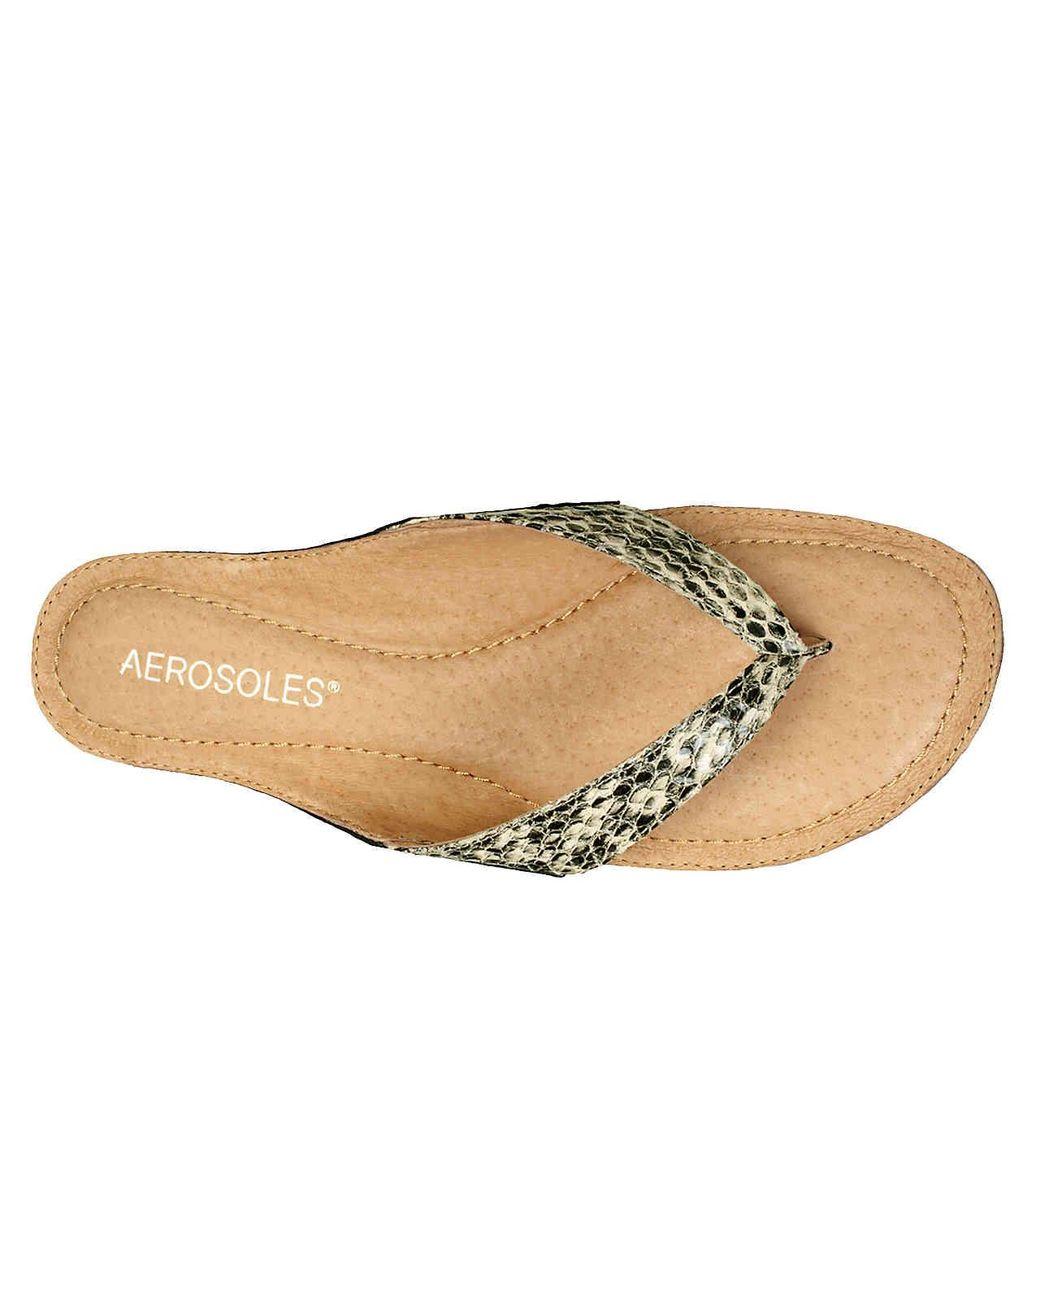 Aerosoles Leather Pocketbook Sandal in